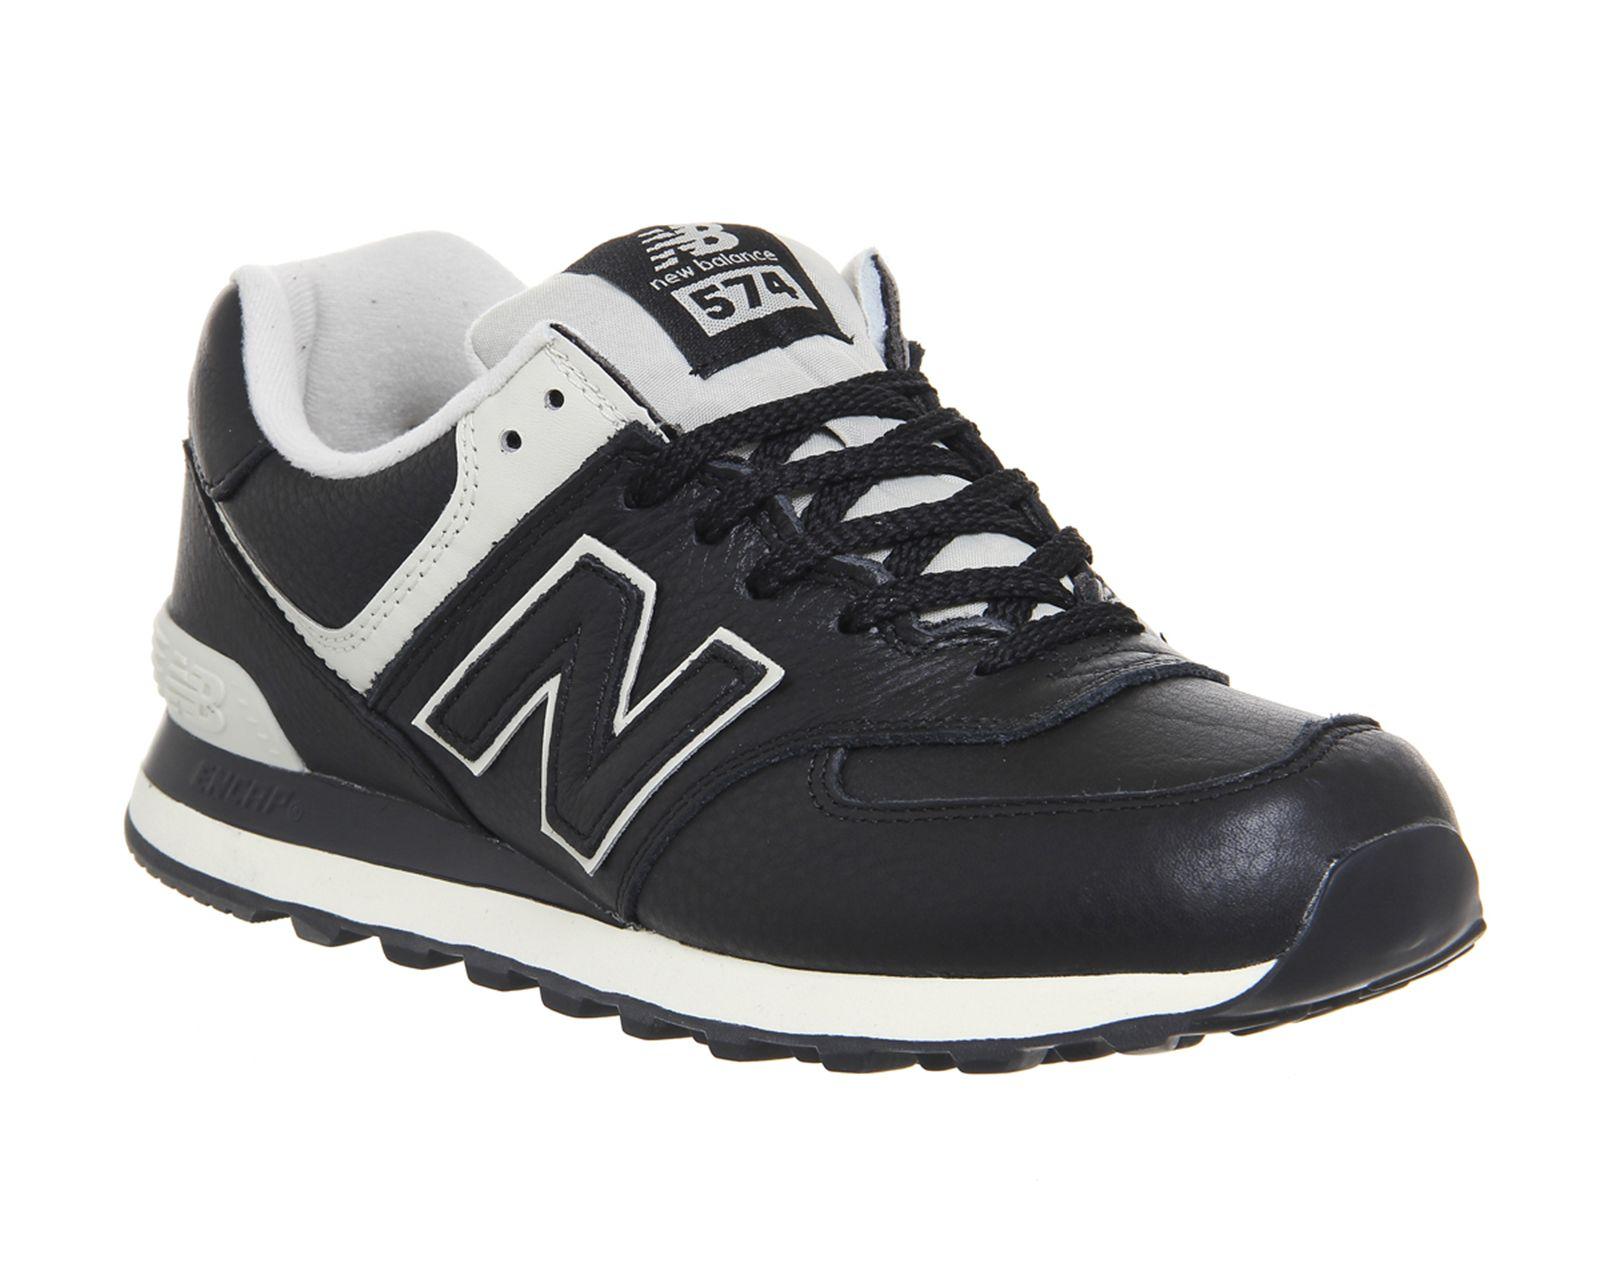 New Balance 574 Black Powder Unisex Sports New balance